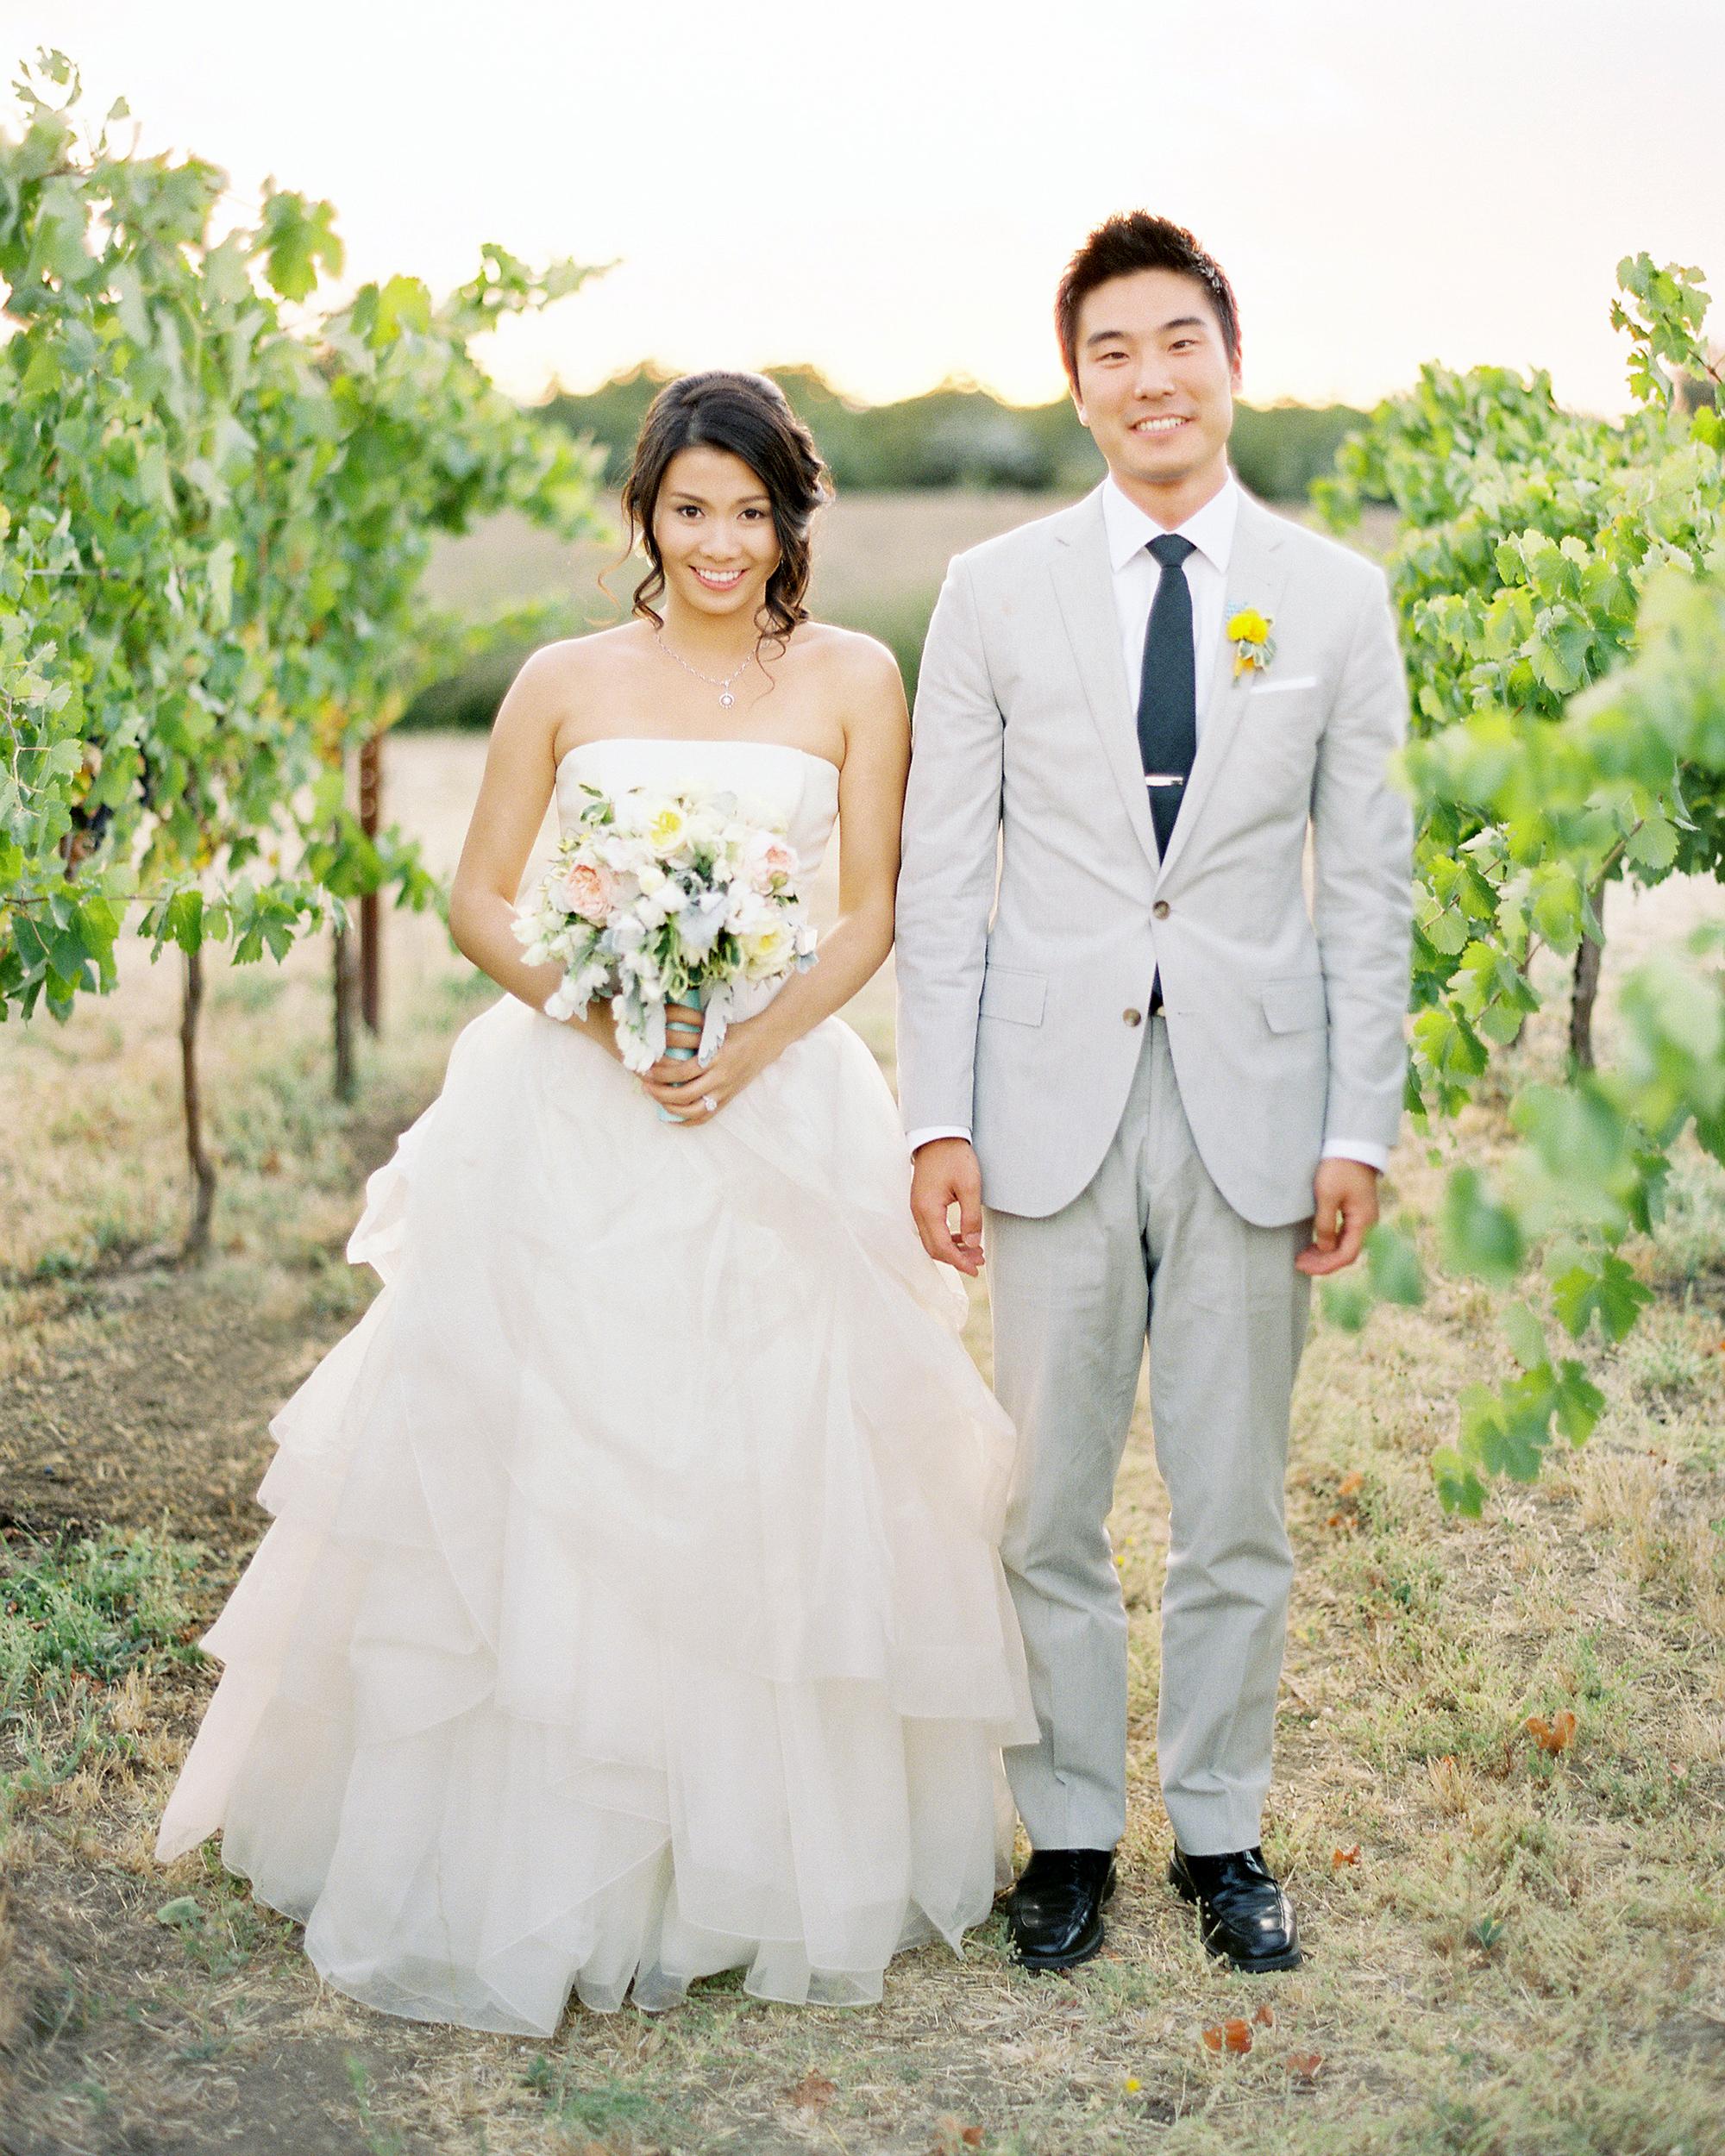 real-weddings-zoe-john-006771-R1-002.jpg